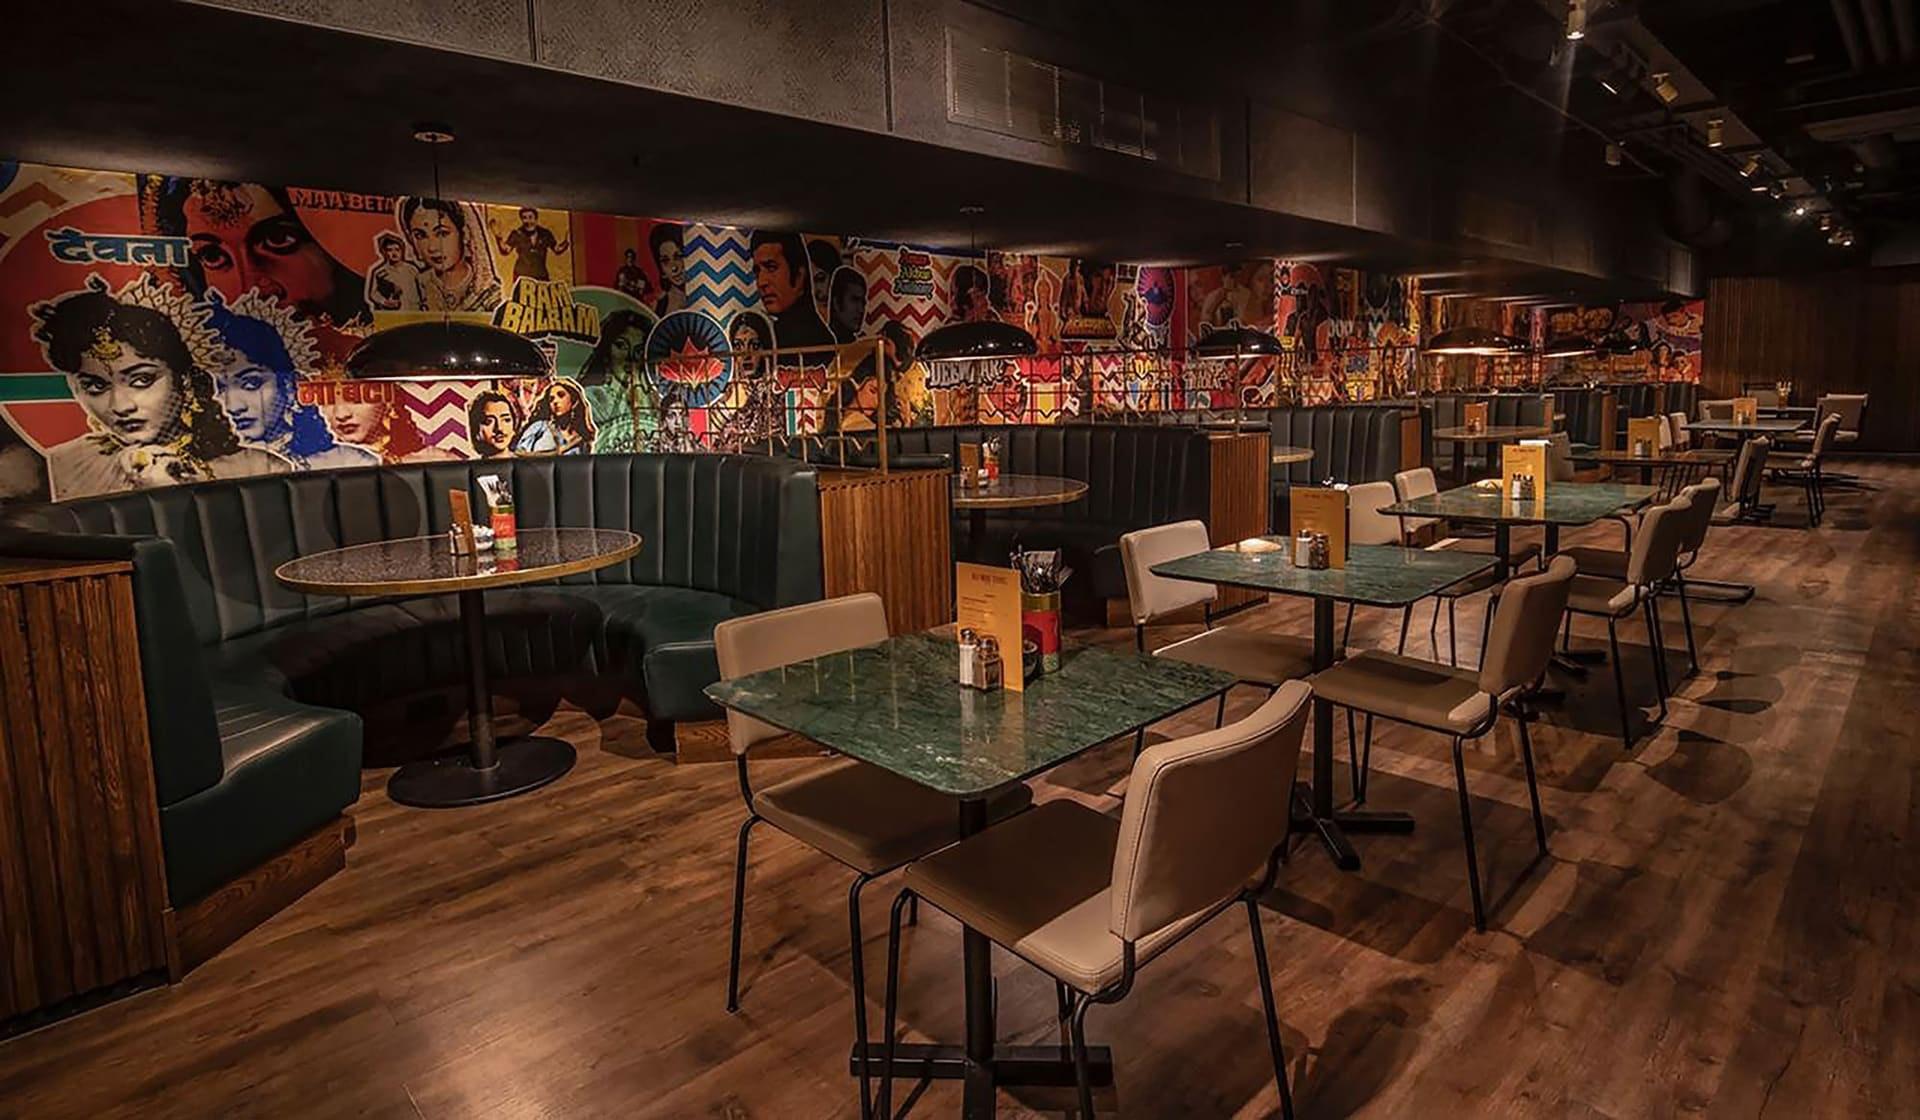 Interior of restaurant in London